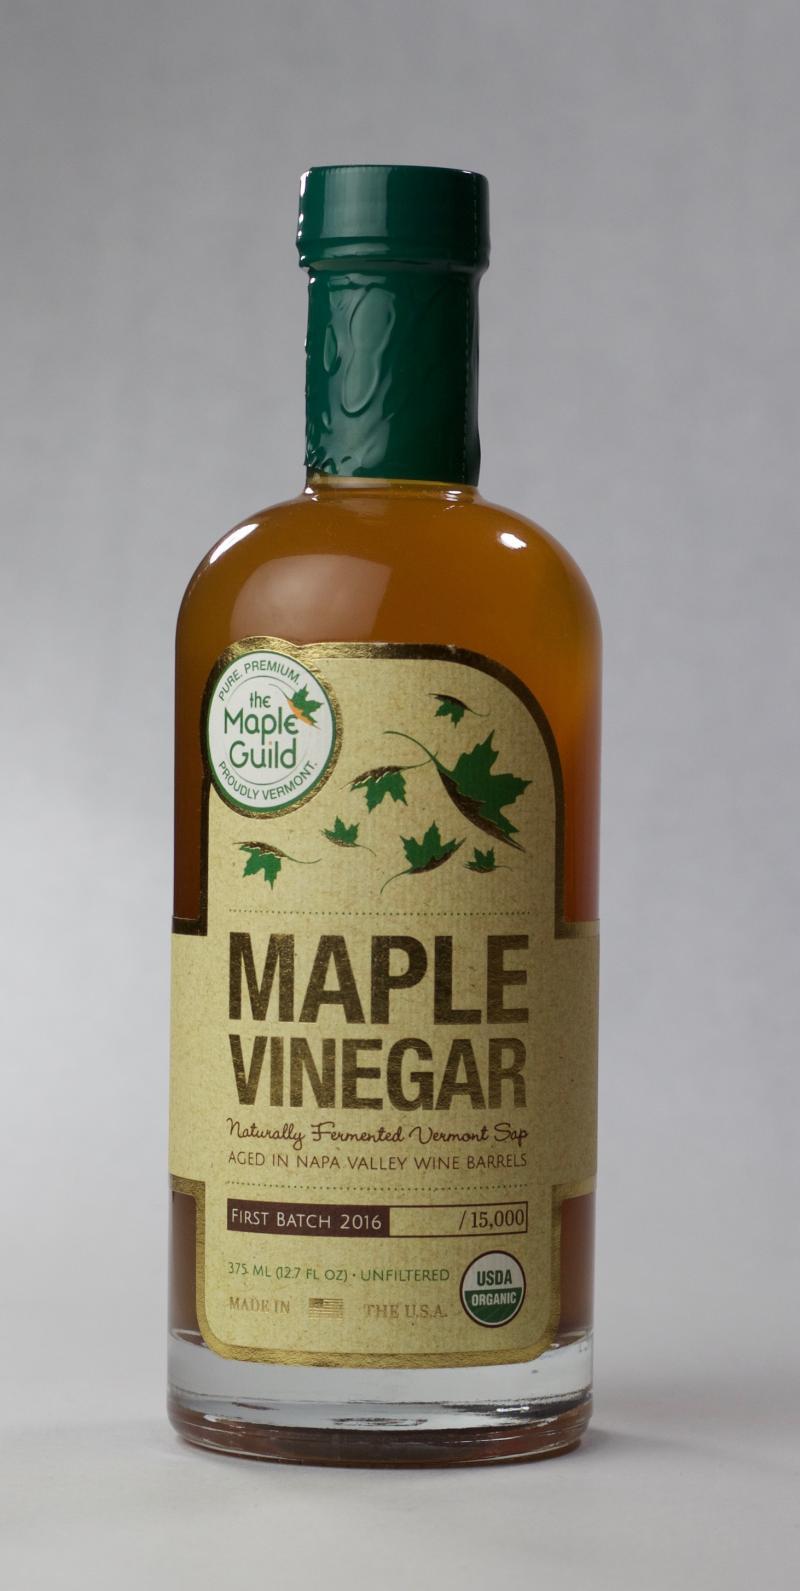 Barrel Aged Maple Vinegar